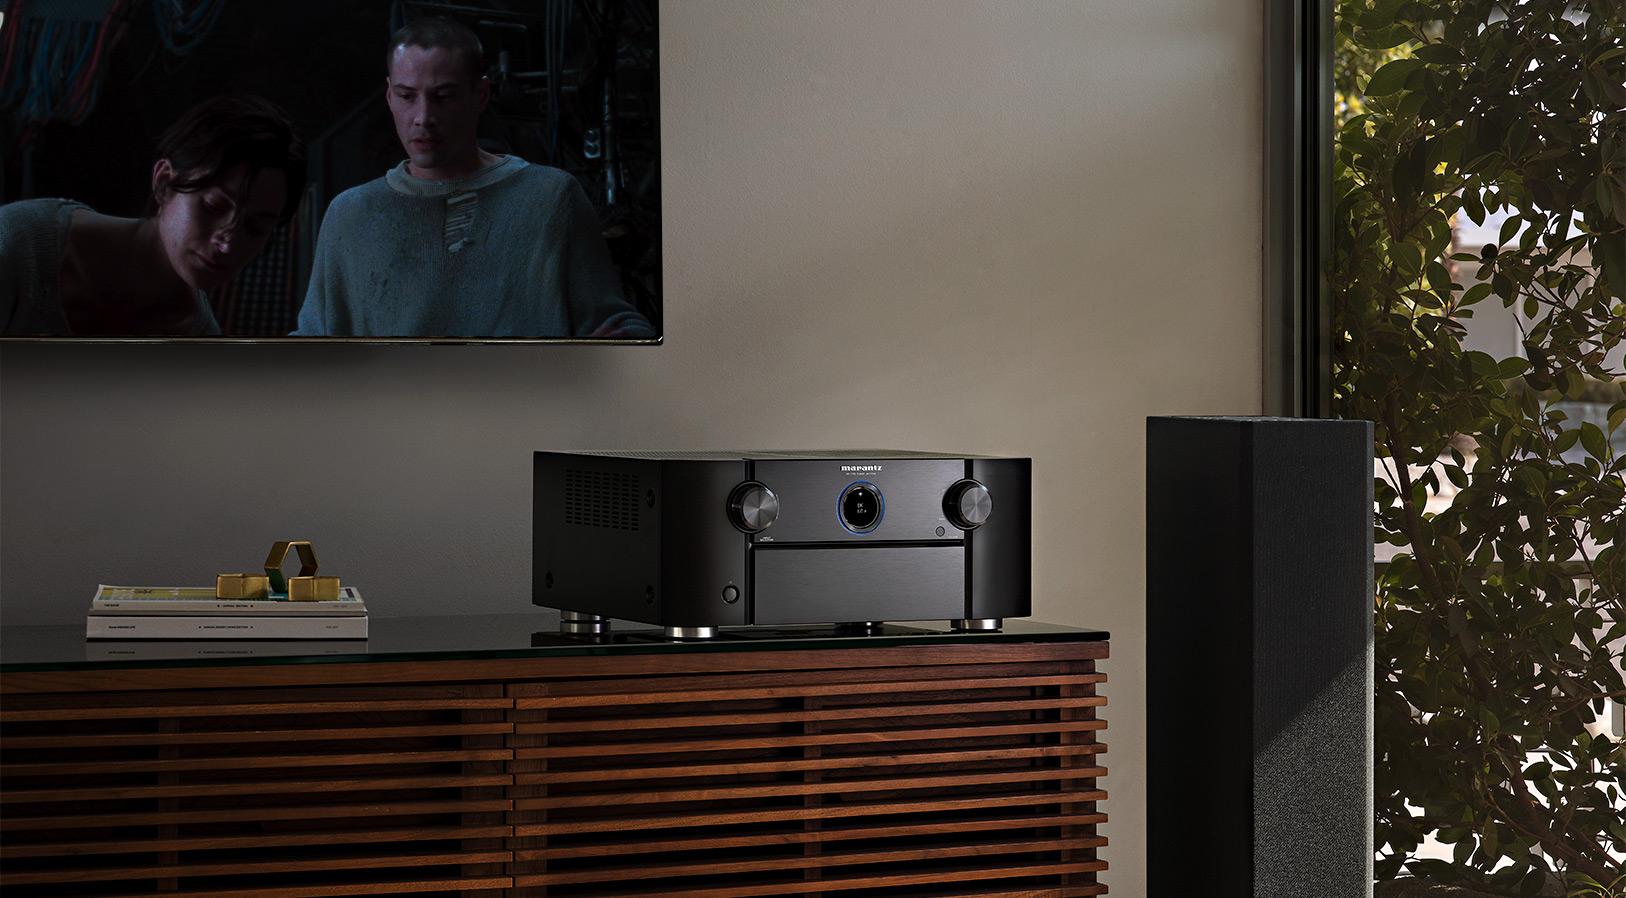 Marantz AV7706 11.2Ch 8K Ultra HD Atmos Network AV Preamplifier Marantz_AV7706_Lifestyle-Movie-Playback-1626w